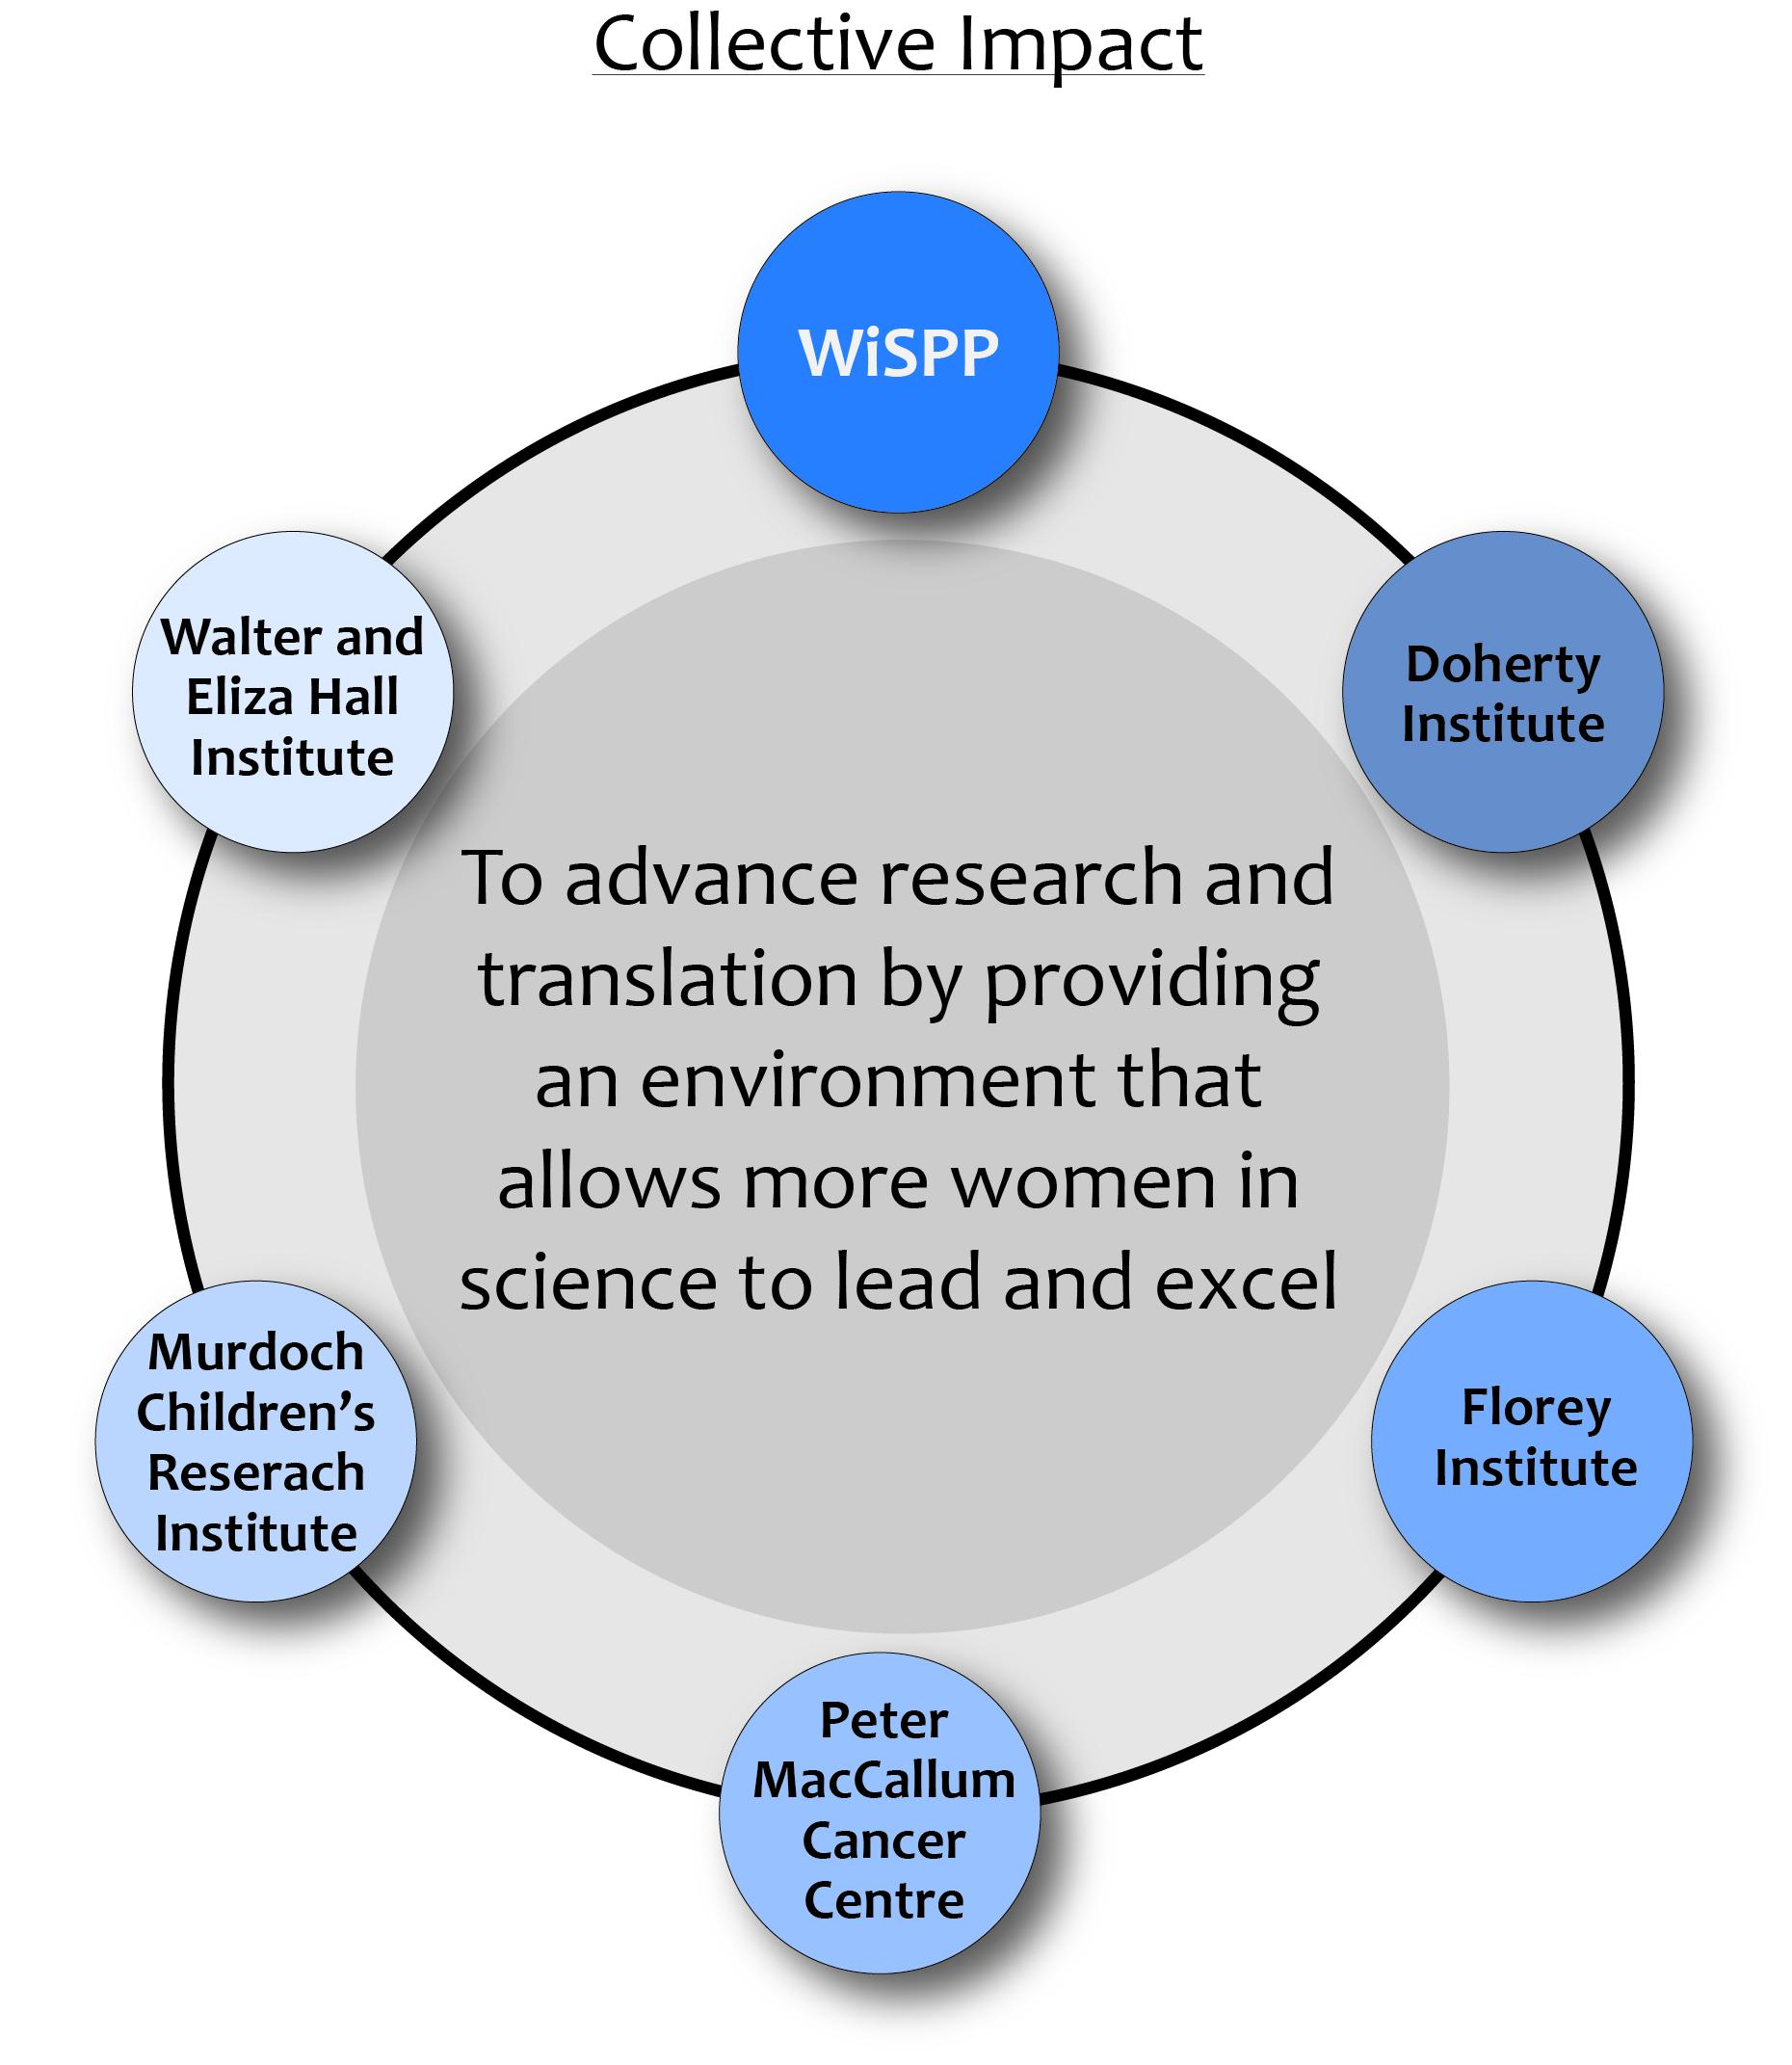 WiSPP-Collective Impact.jpg